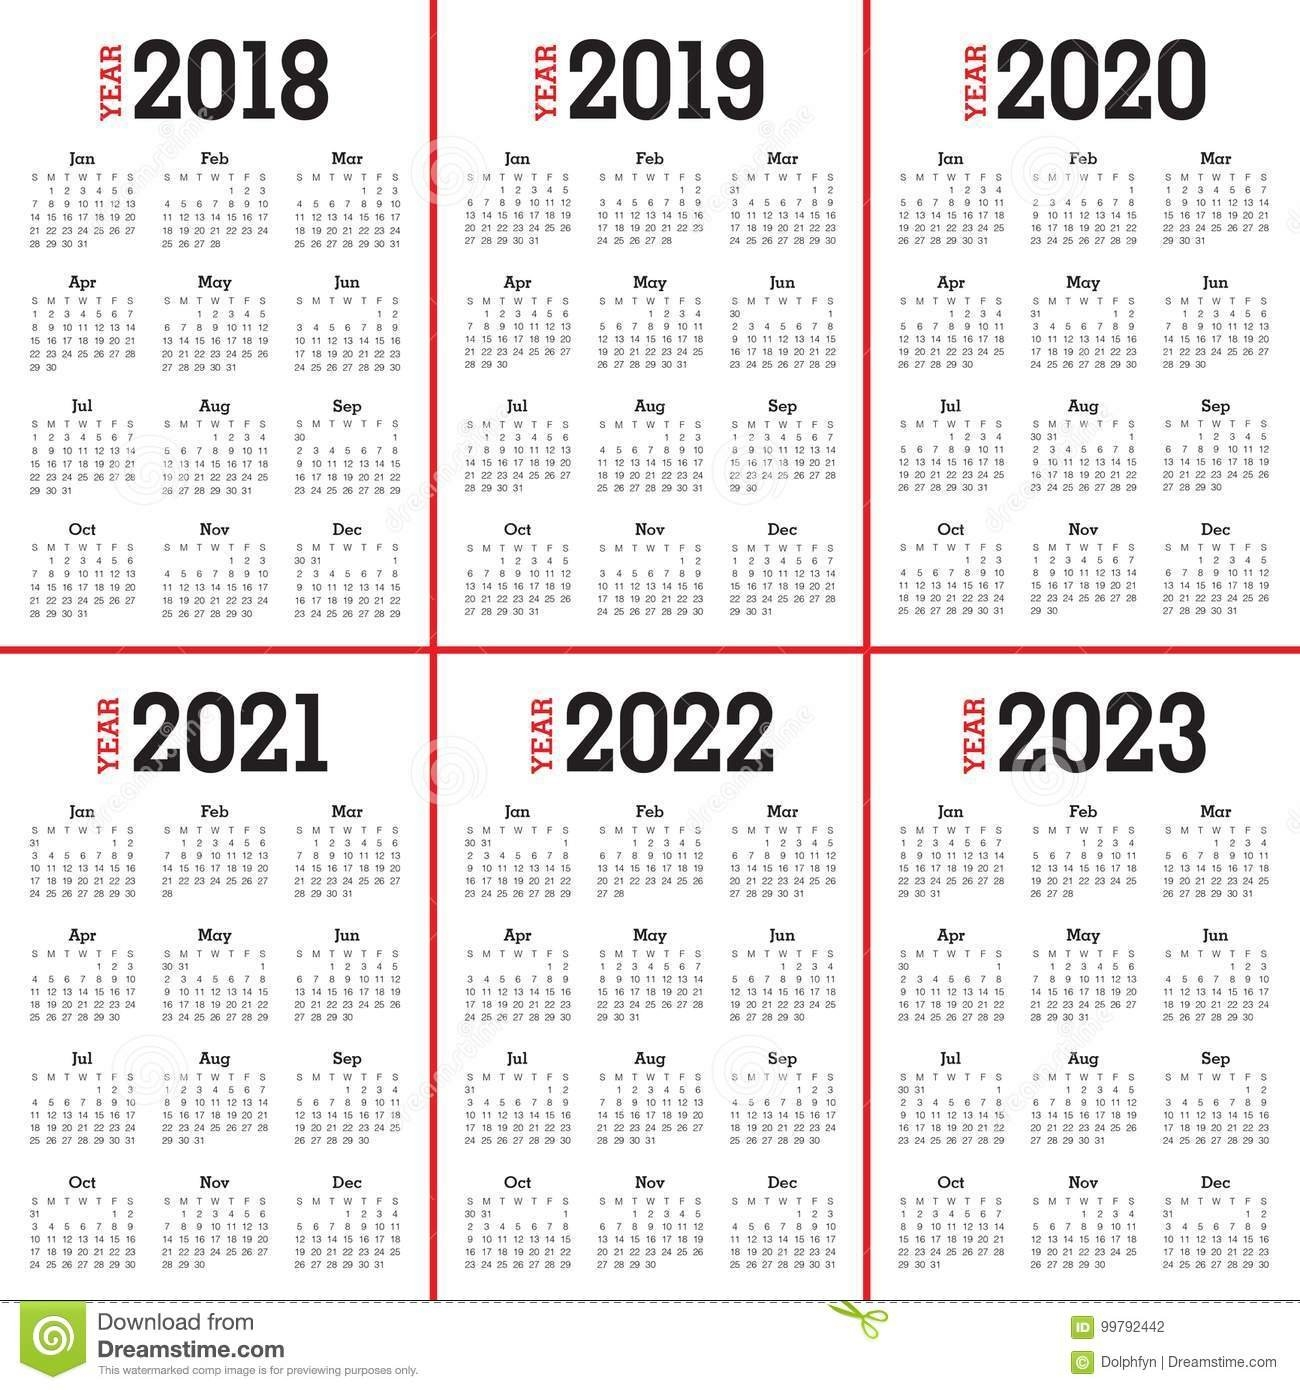 Six Year Calendar 2018 2019 2020 2021 2022 And 2023. Editorial 4 Year Calendar 2019 To 2022 Printable